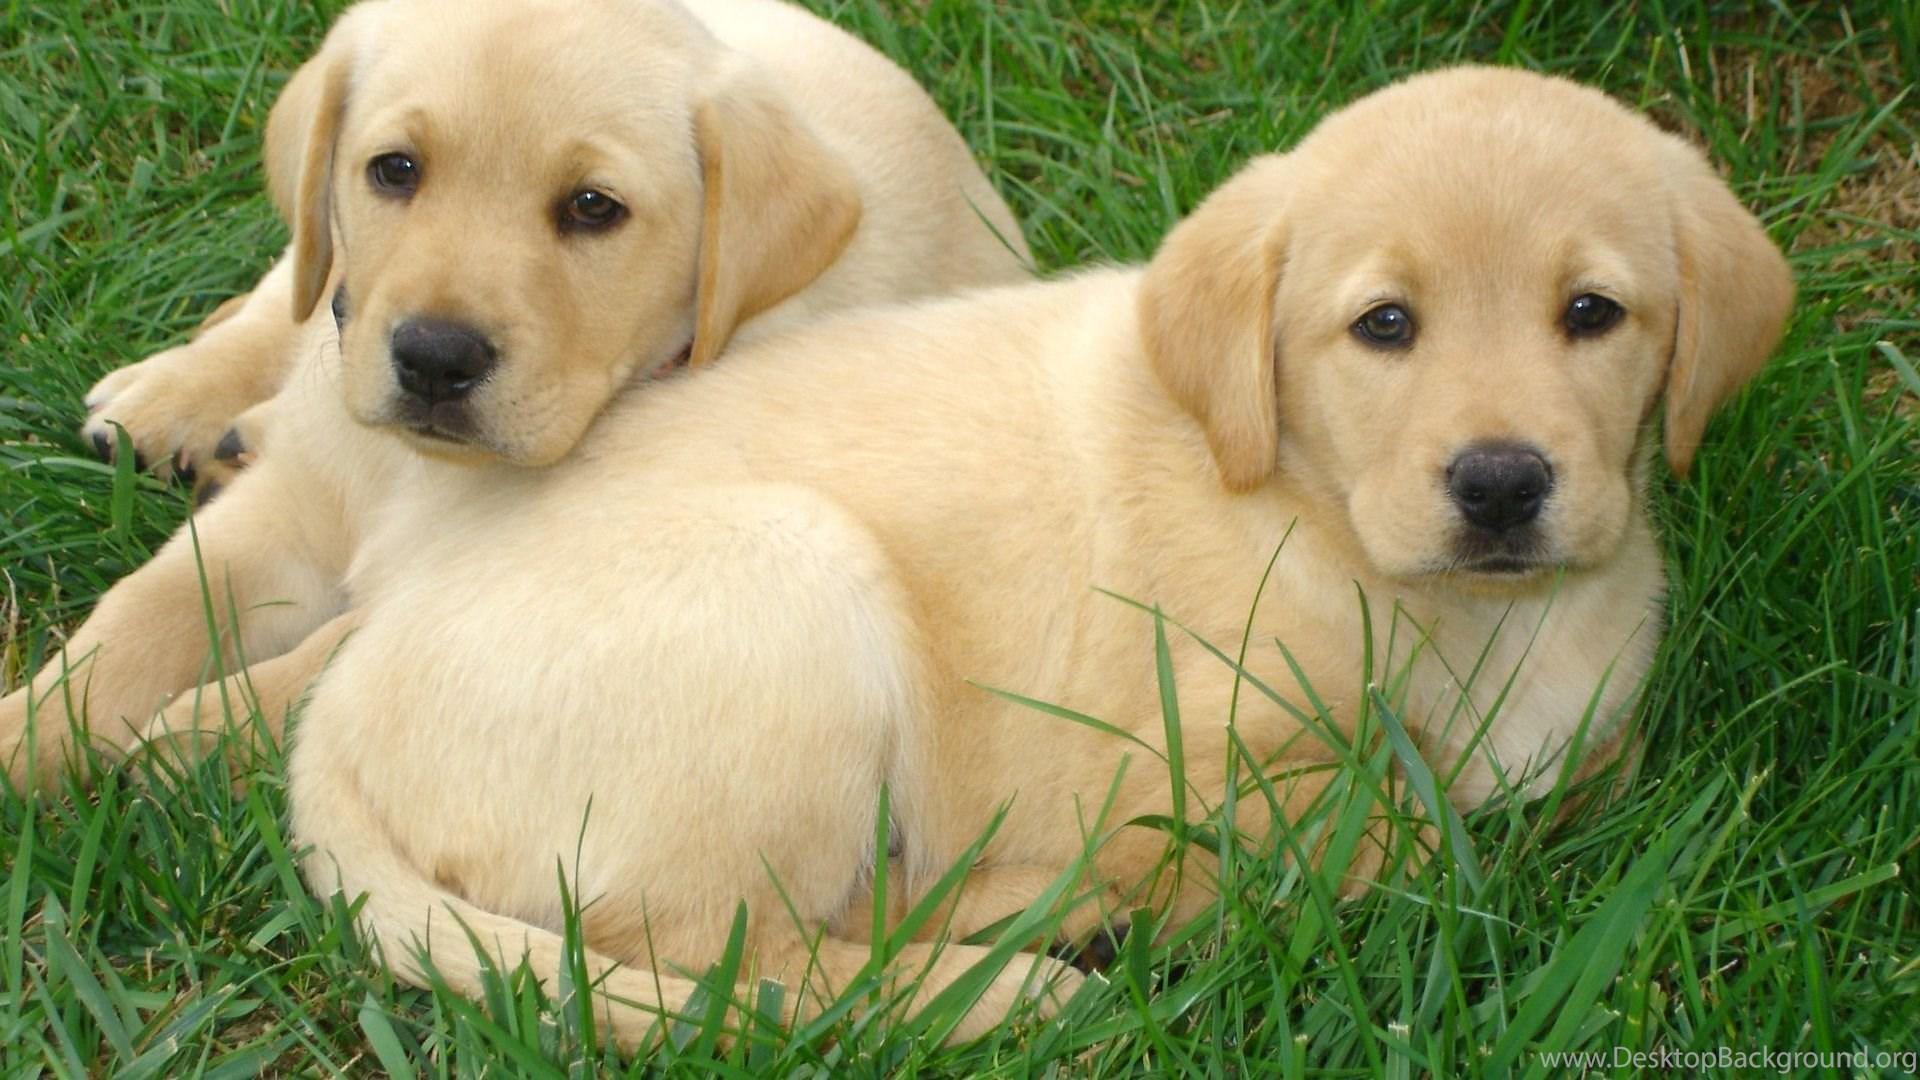 labrador retriever puppies free hd wallpapers desktop background